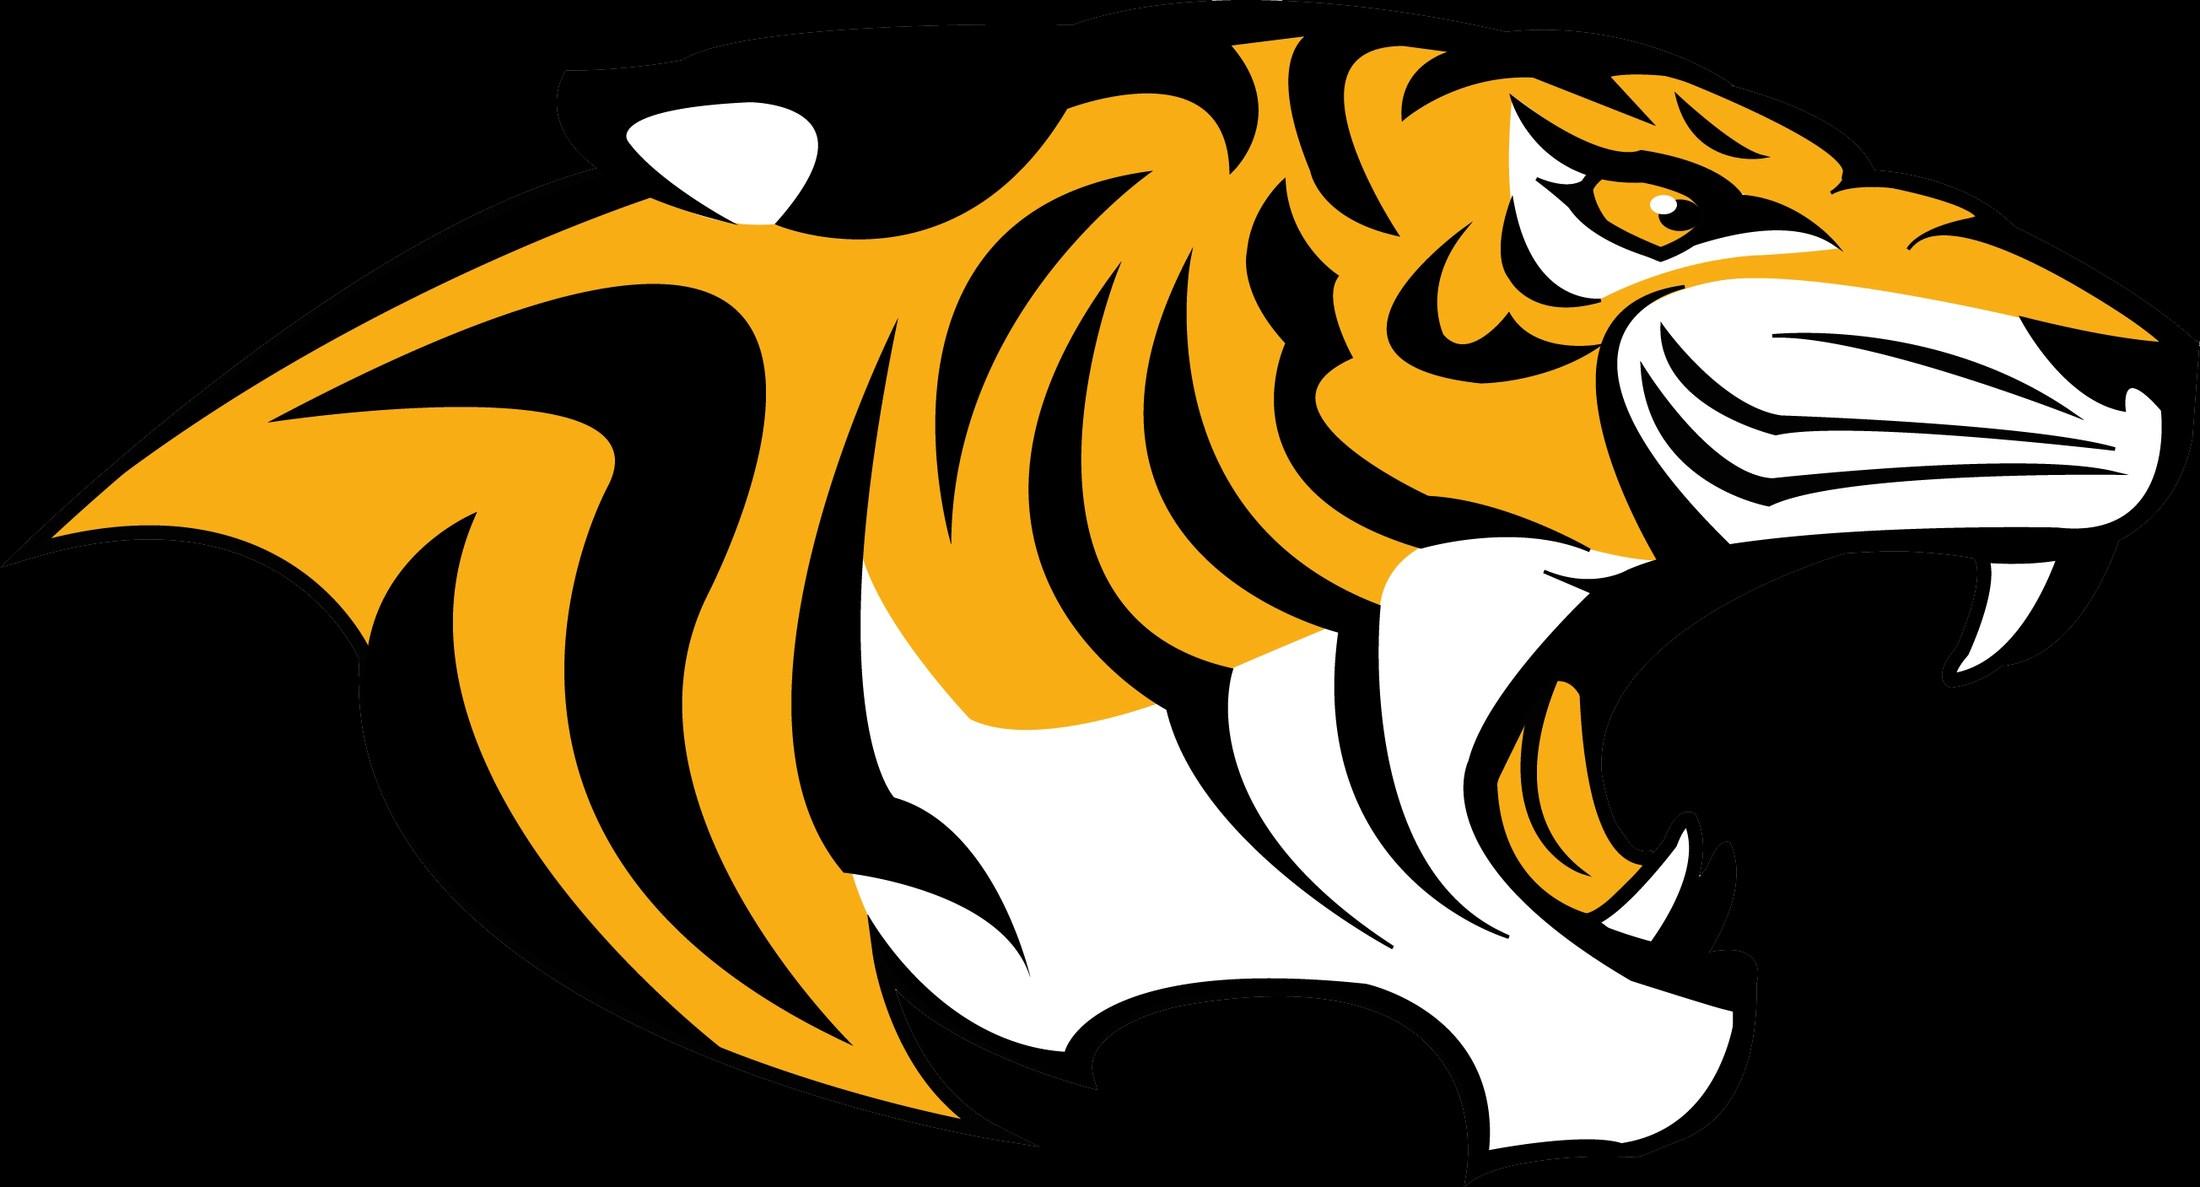 tiger head logo - HD2608×1407